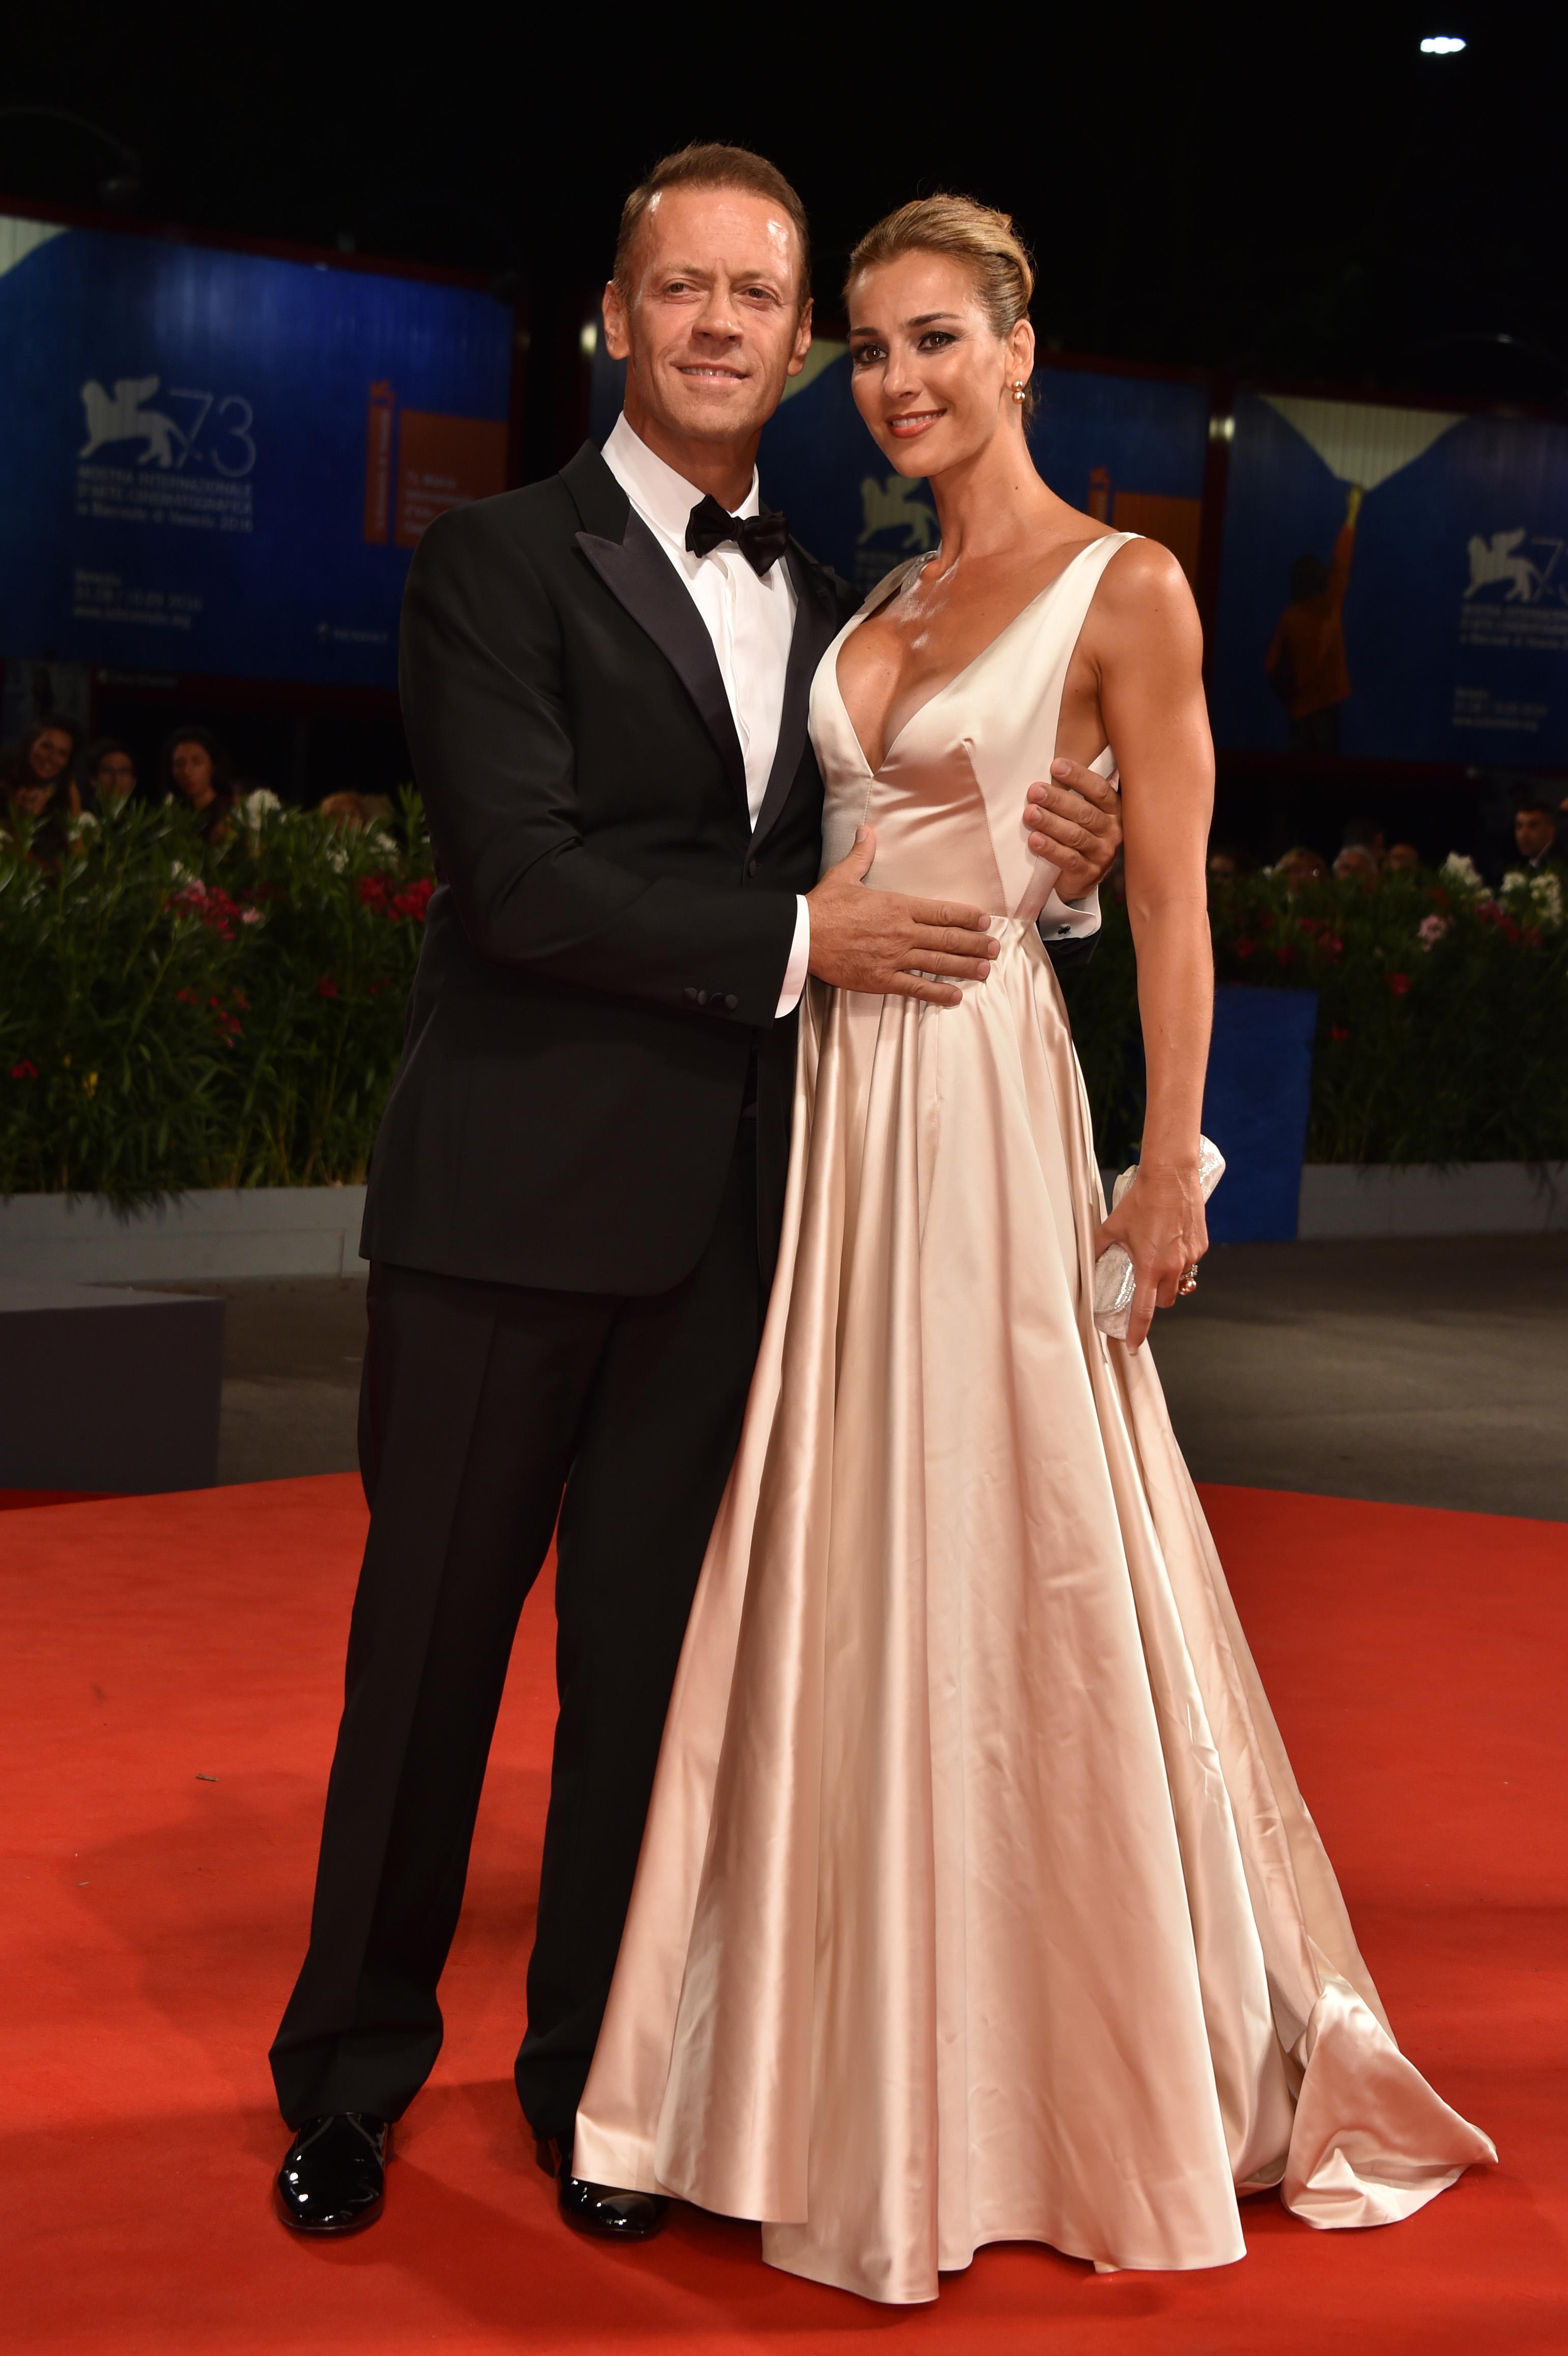 Rocco Siffredi y su esposa Rosa Caracciolo